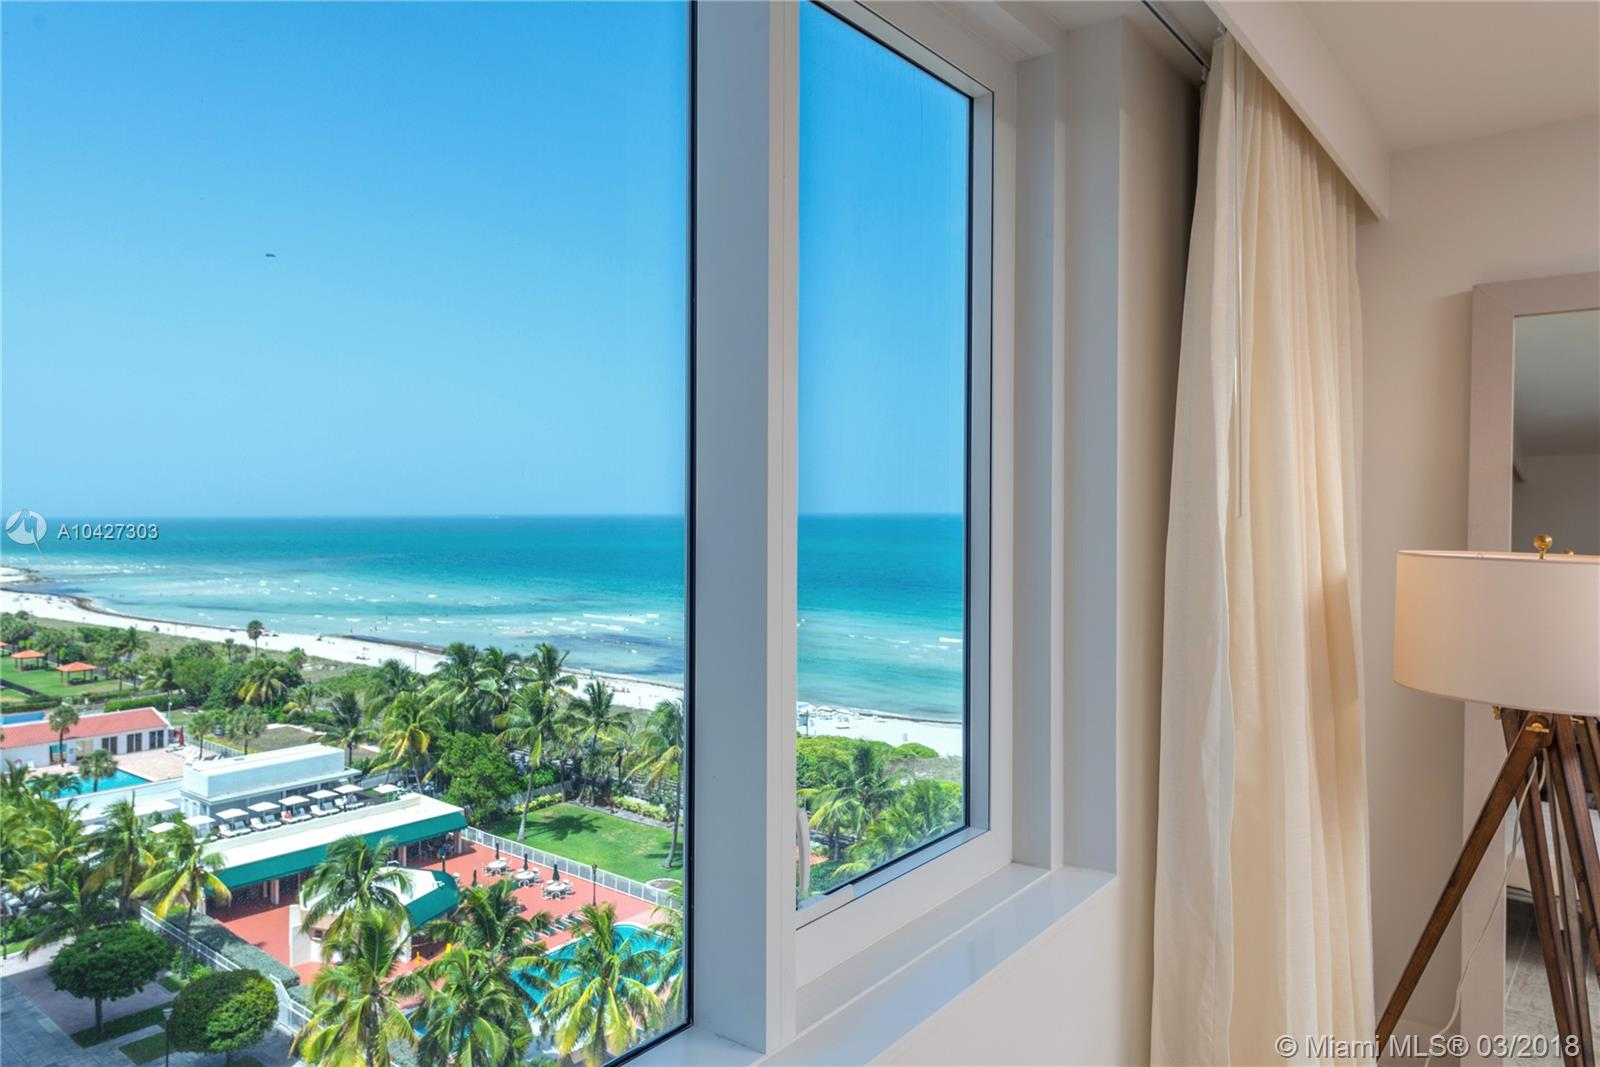 1 Hotel & Homes #915 - 102 24th St #915, Miami Beach, FL 33139